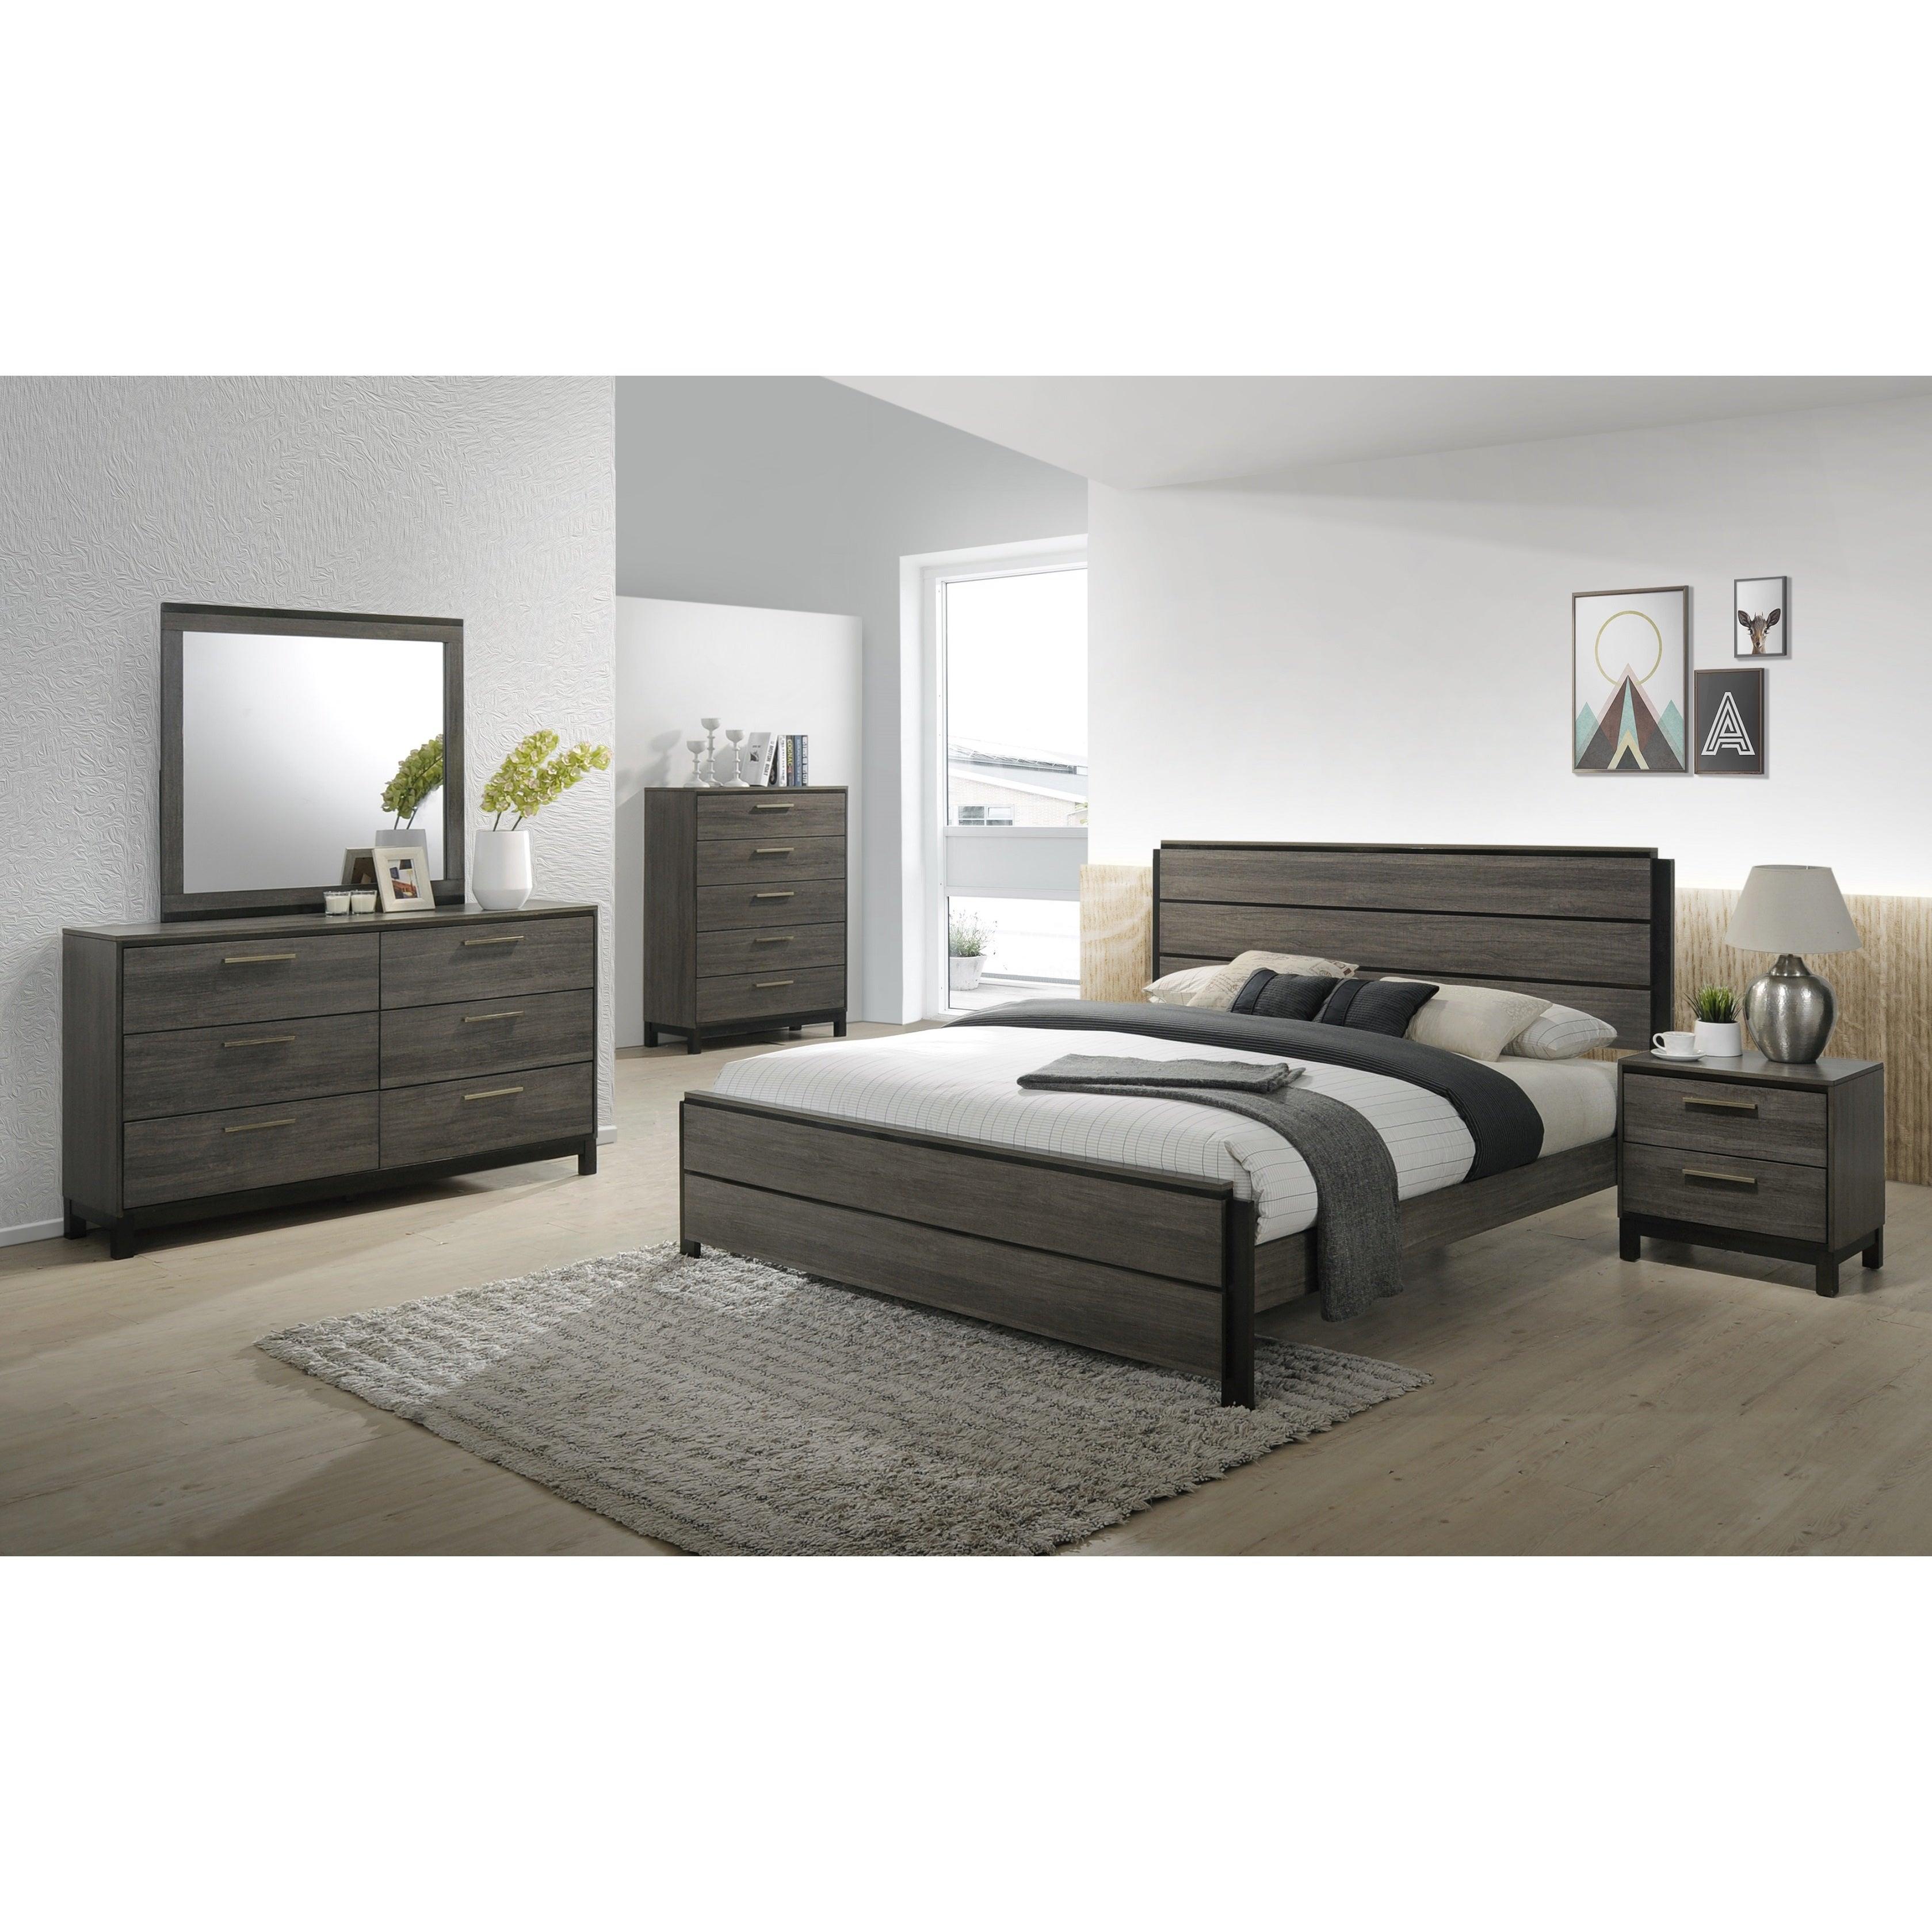 Carbon Loft Lippmann Antique Grey Finish Wood Queen Size Bedroom Set